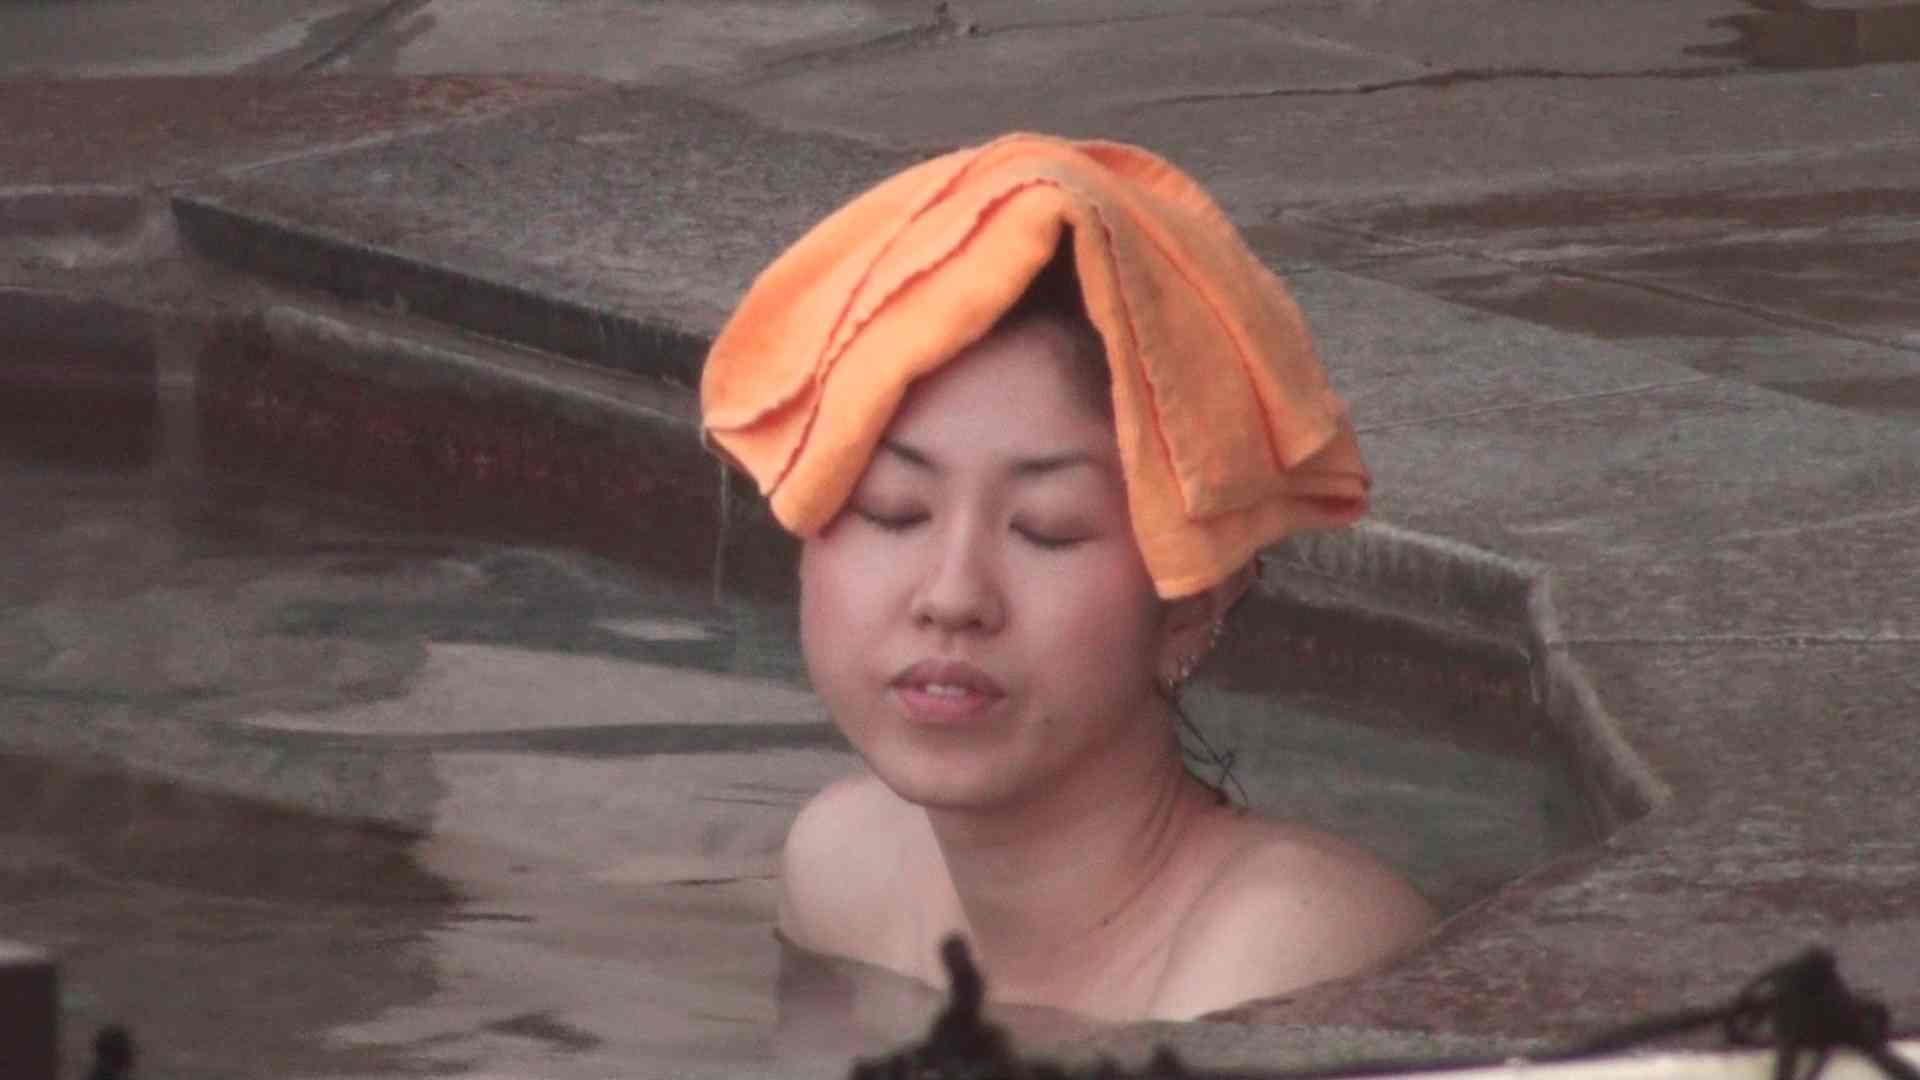 Aquaな露天風呂Vol.135 盗撮師作品  105pic 42